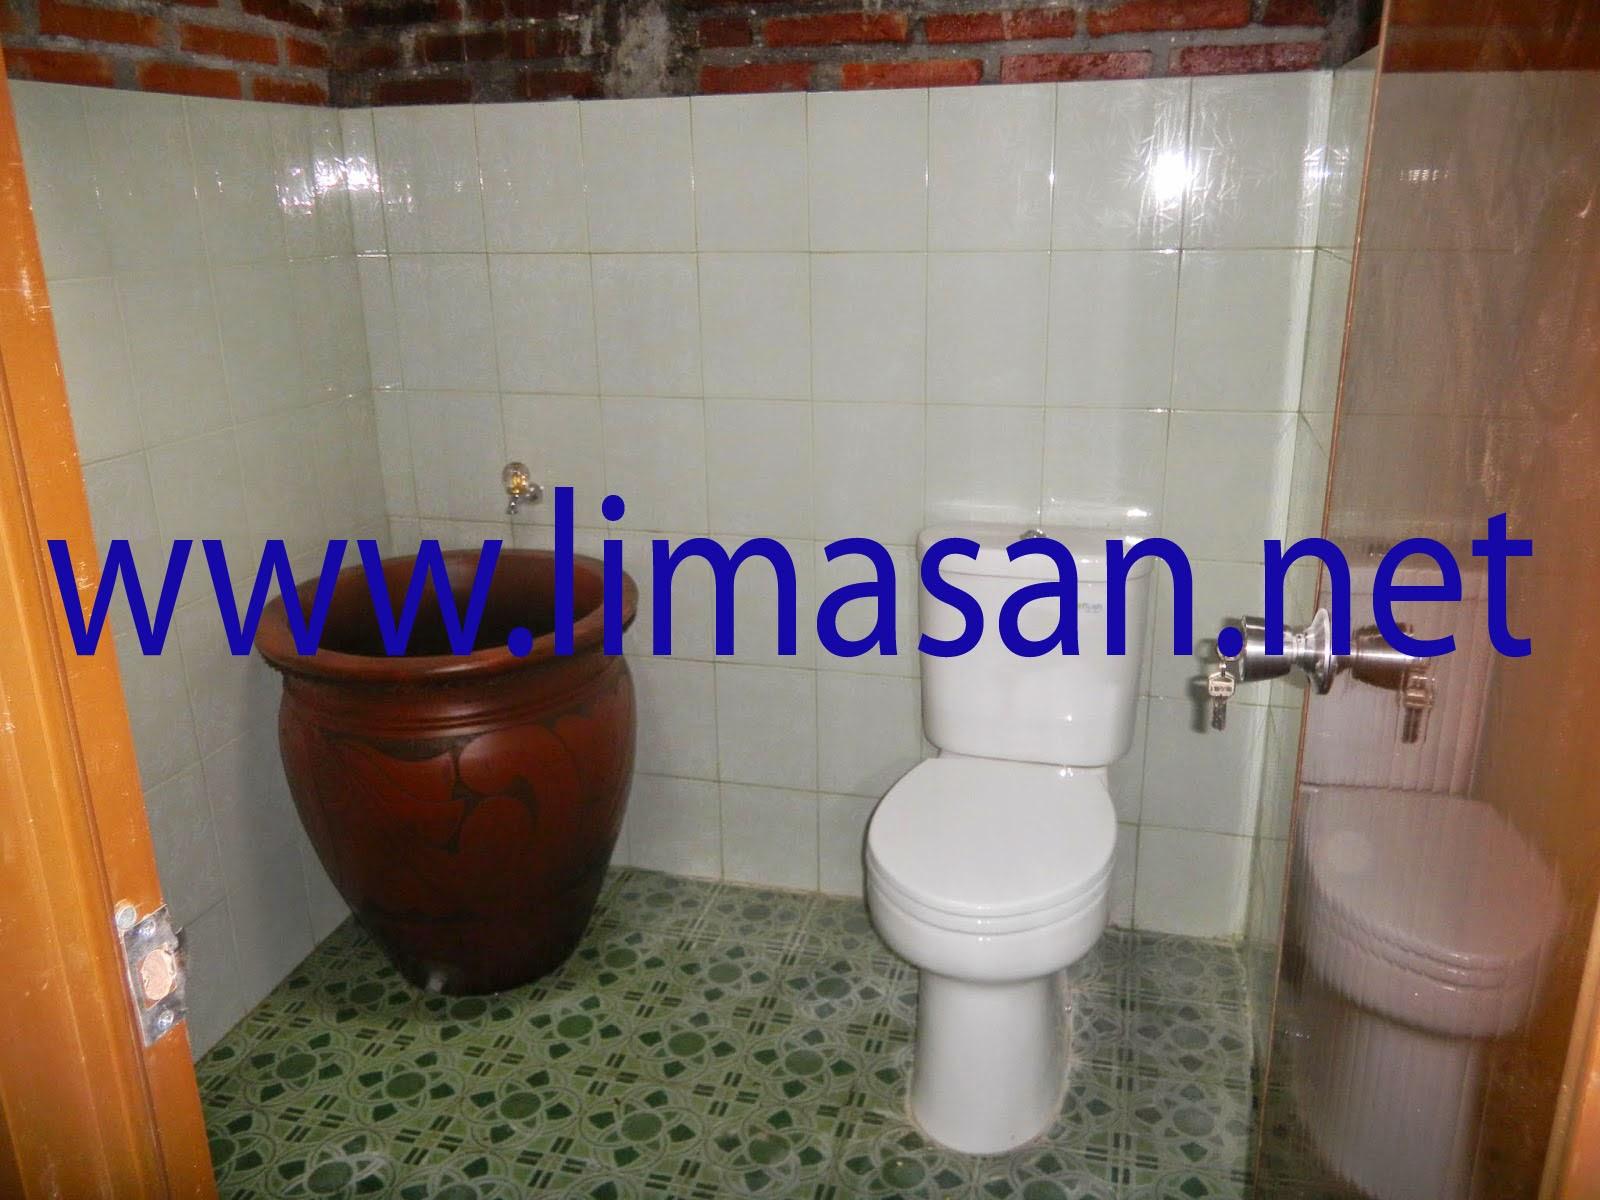 Rumah Limasan Di Sleman Yogyakarta k.mandi